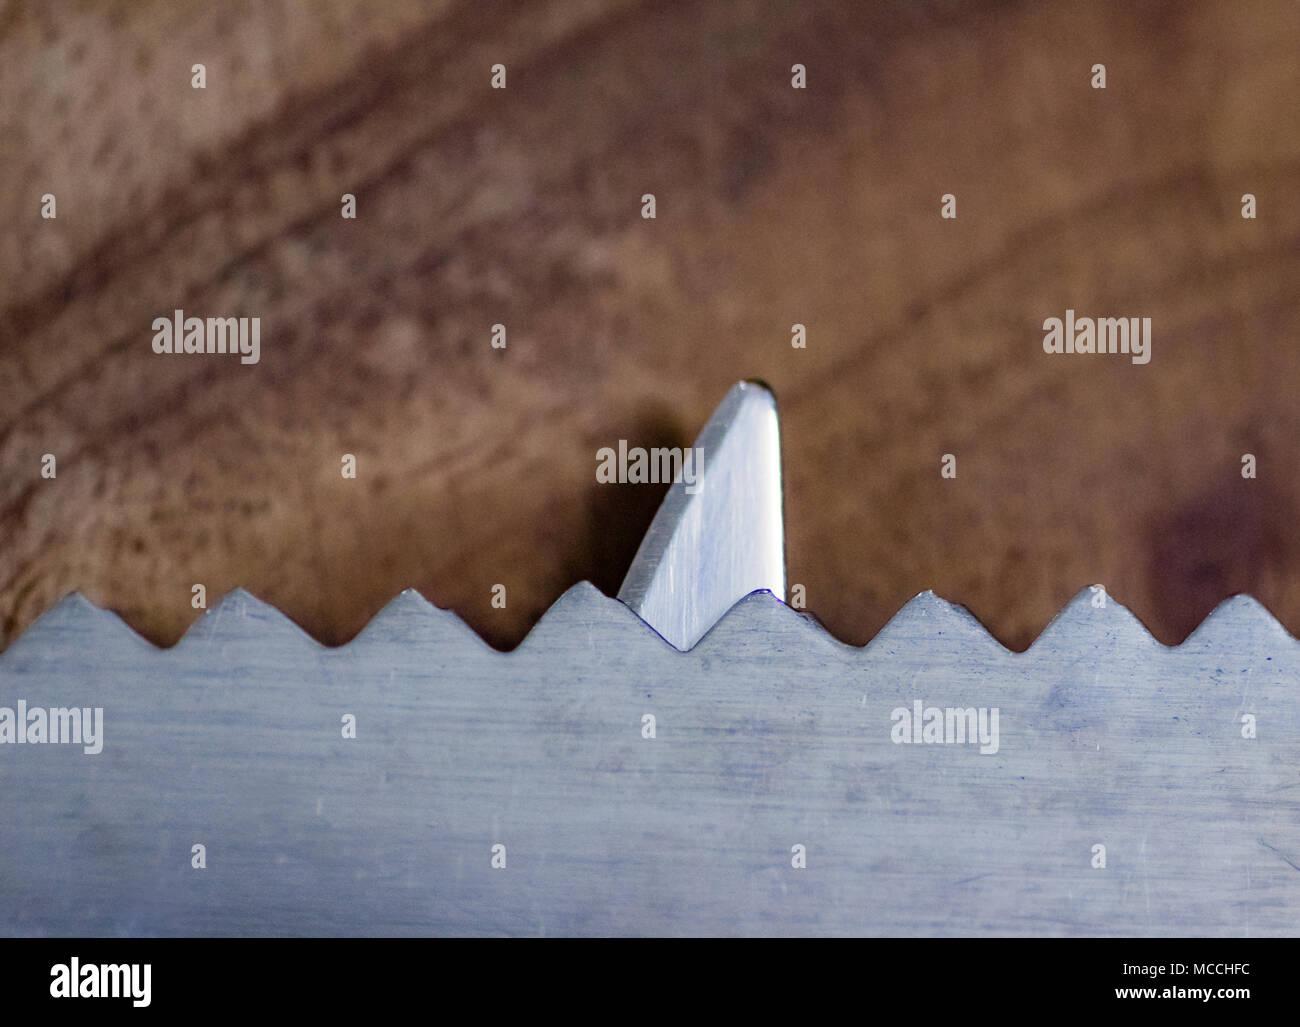 Concept Art Stock Photos & Concept Art Stock Images - Alamy